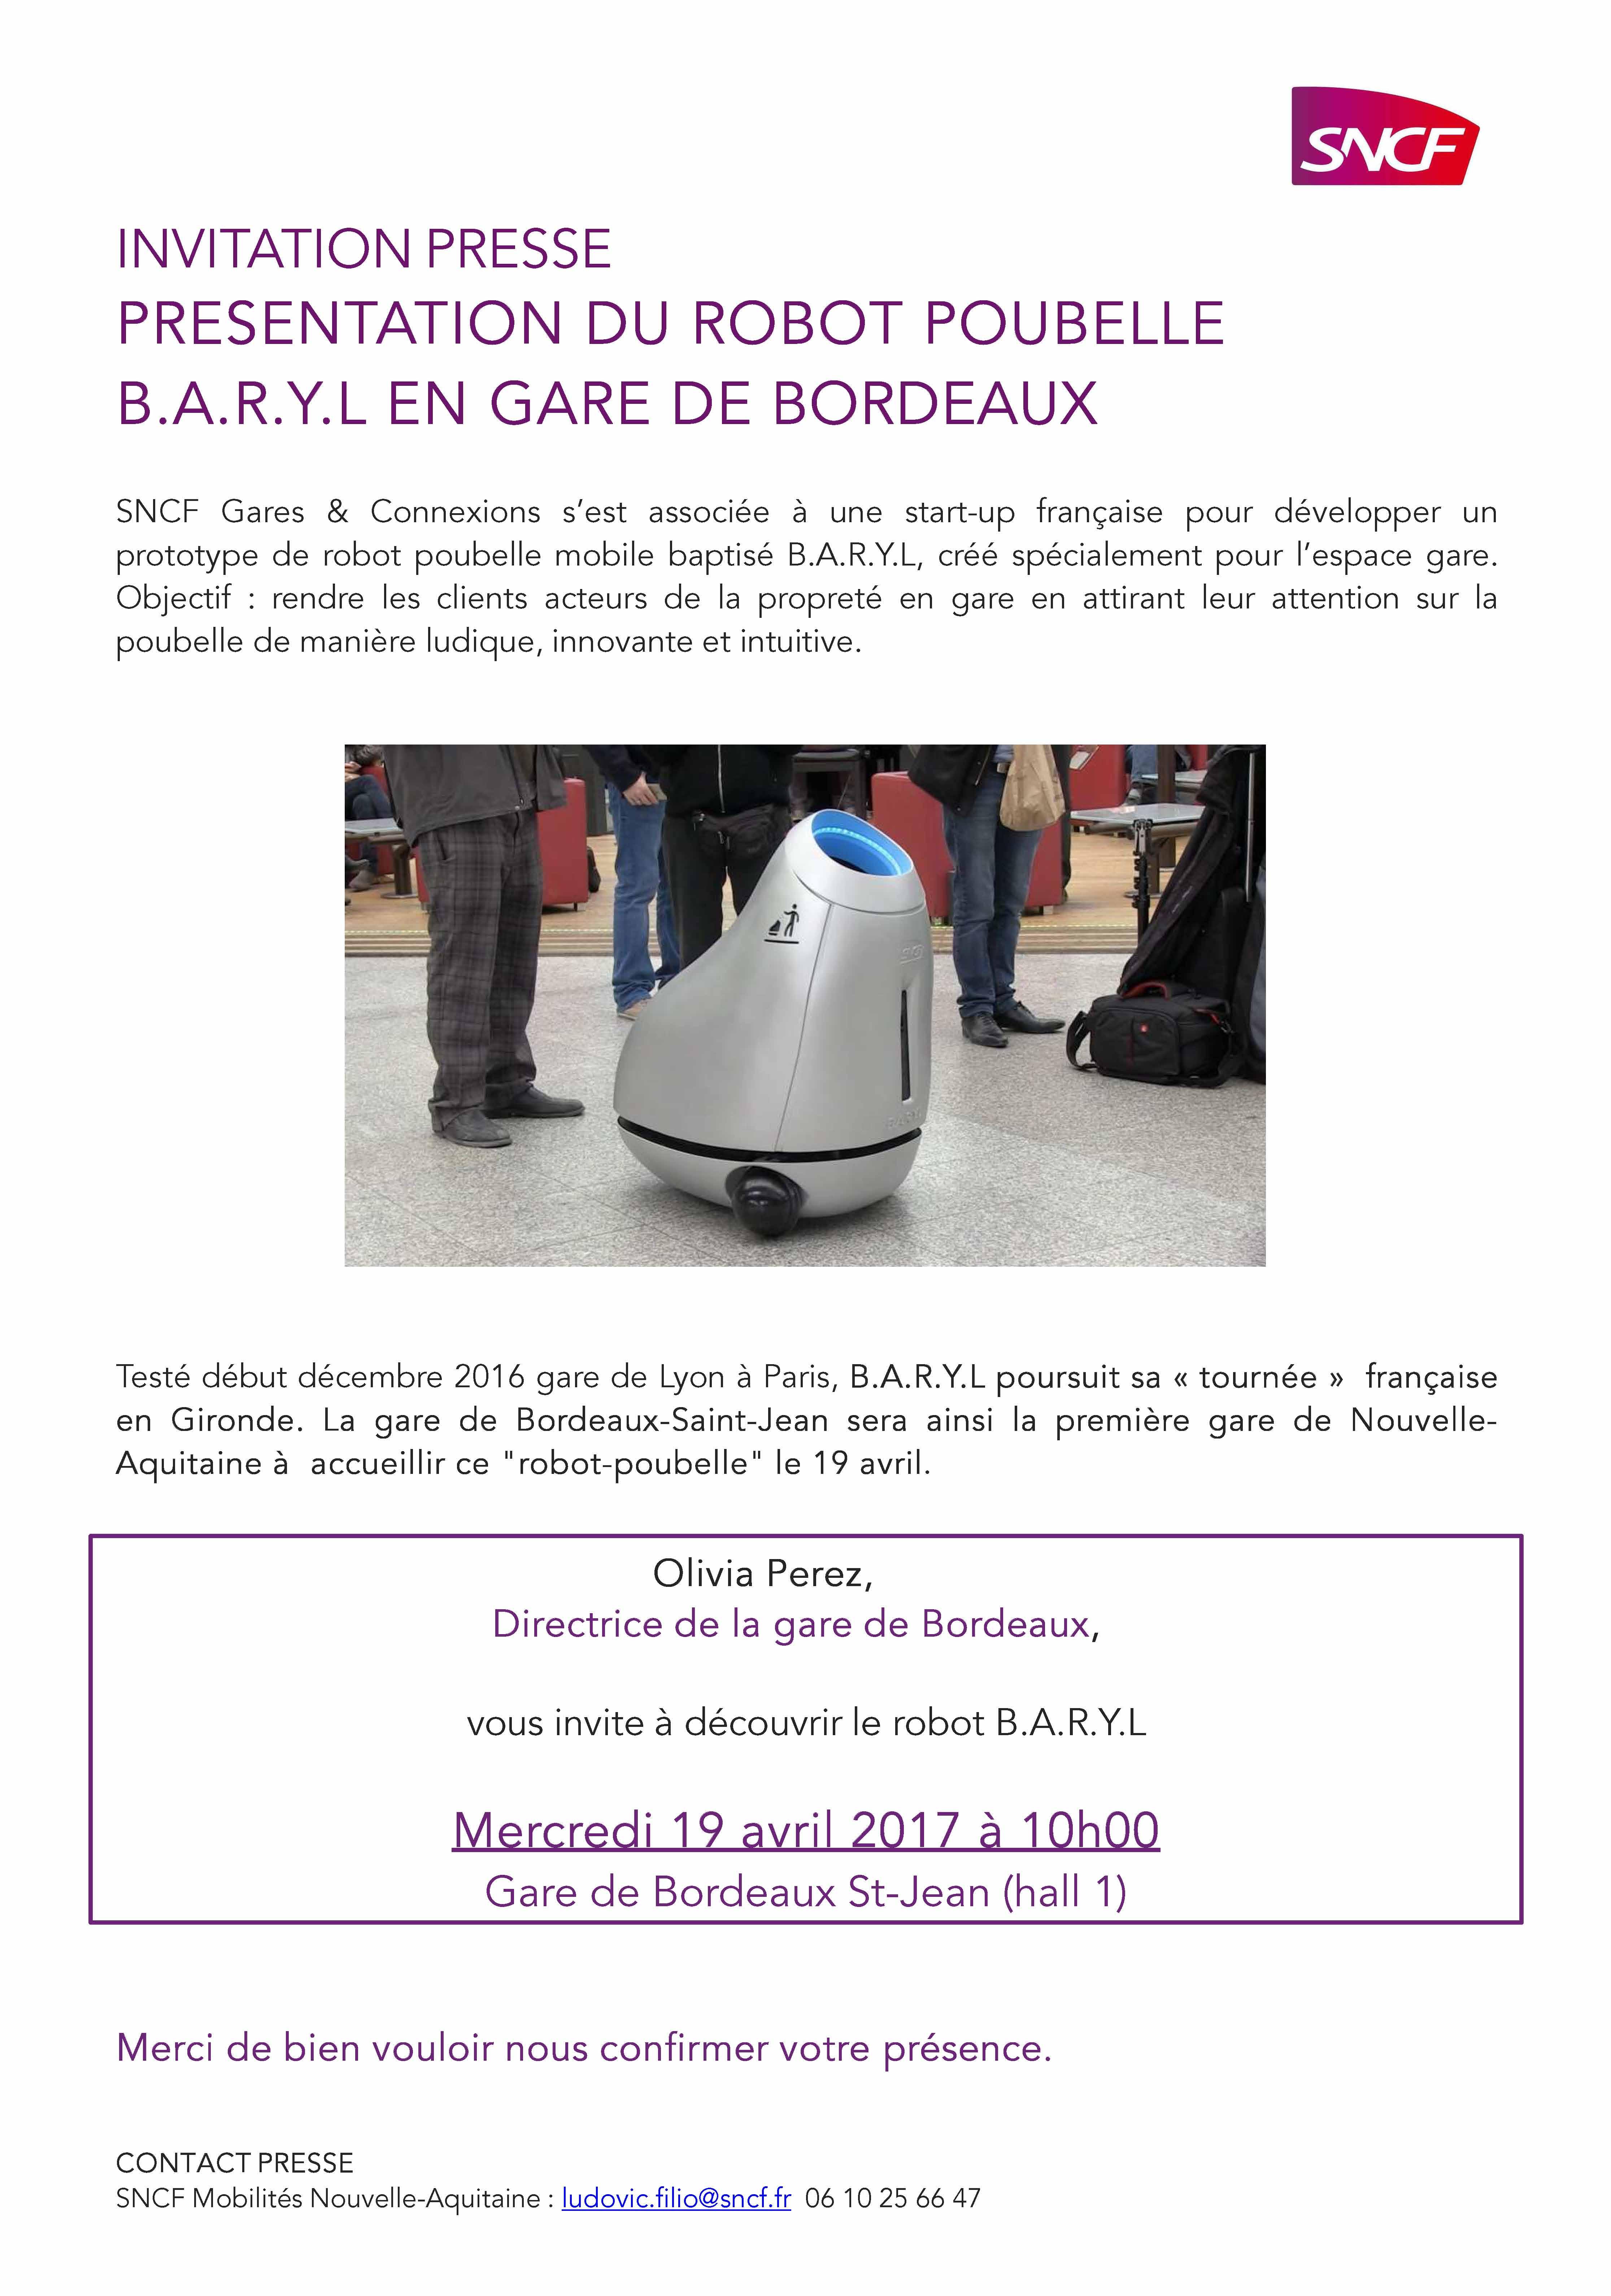 invitation-presse-le-robot-b-a-r-y-l-en-gare-de-bordeaux-190417